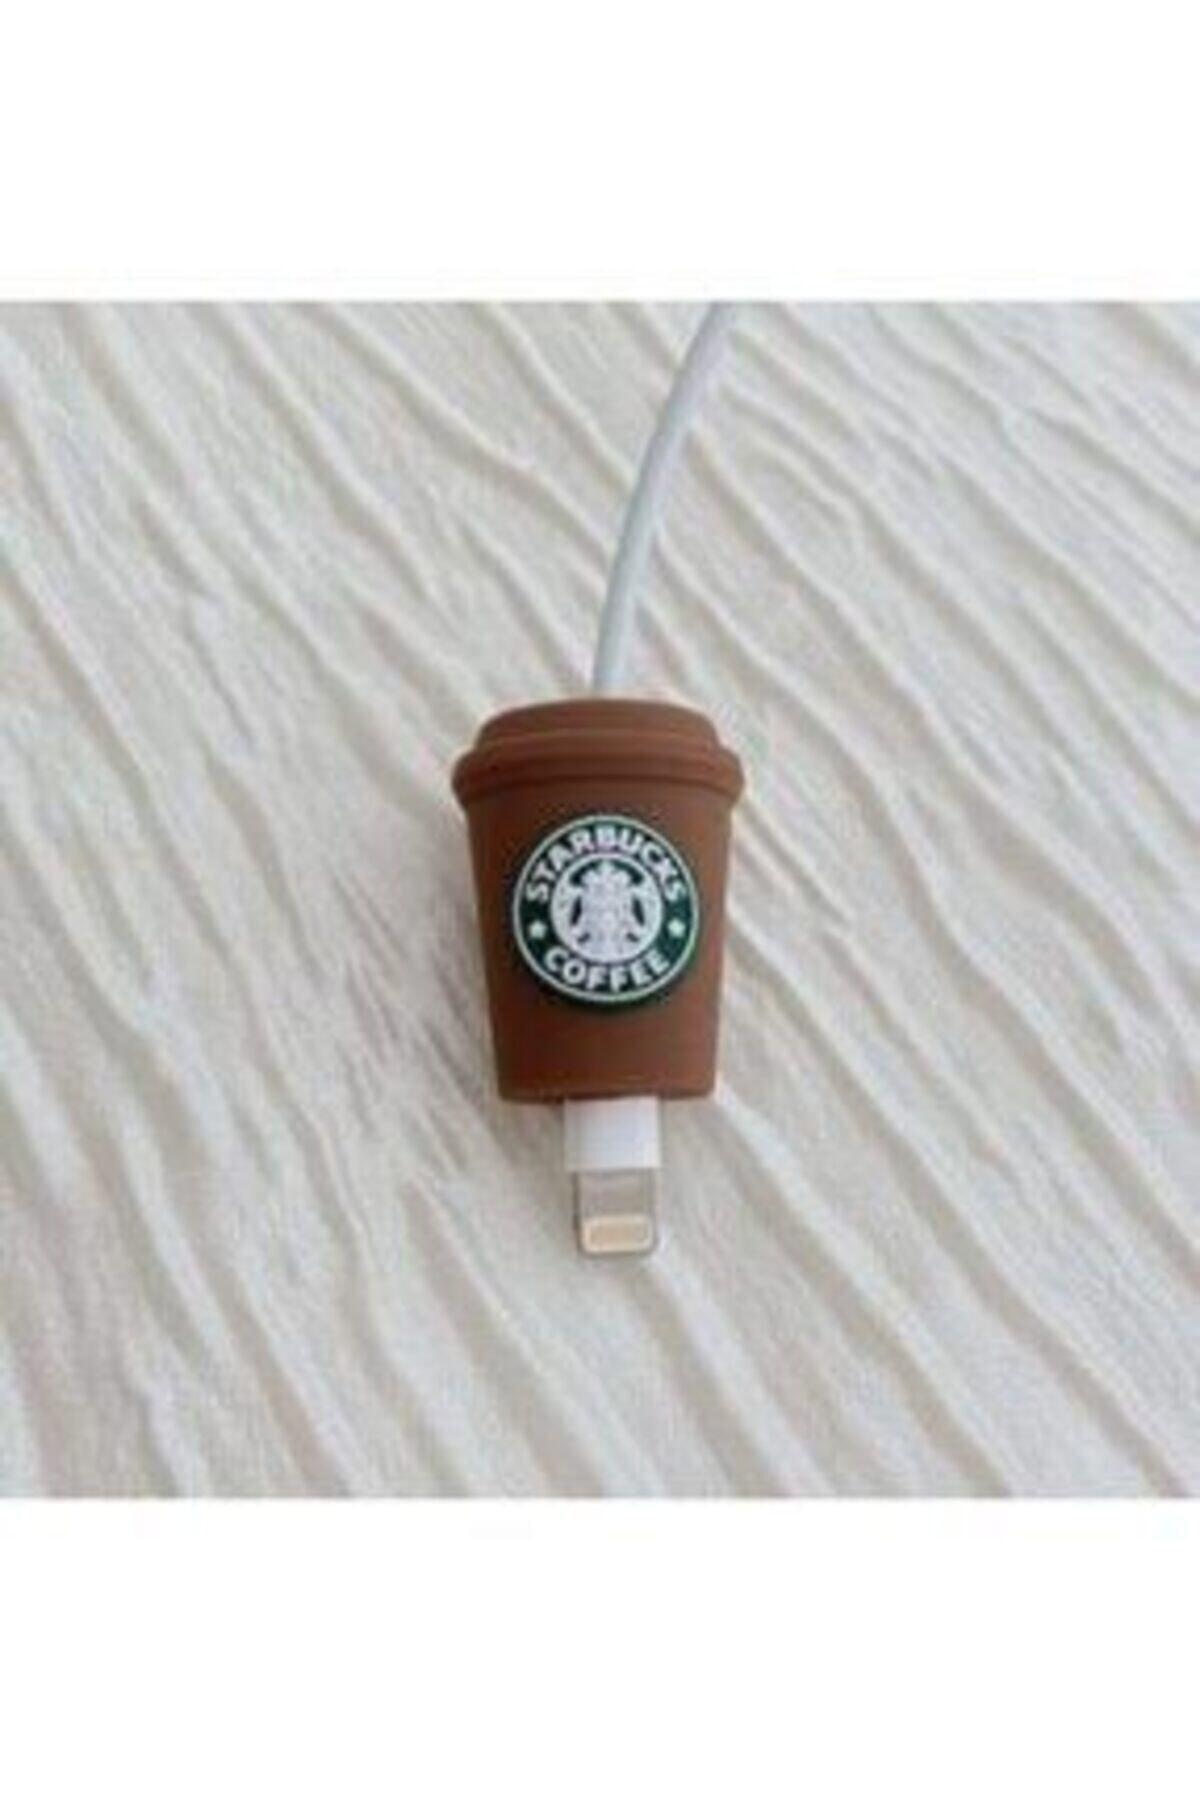 Telehome Sevimli Starbucks Kablo Koruyucu 2